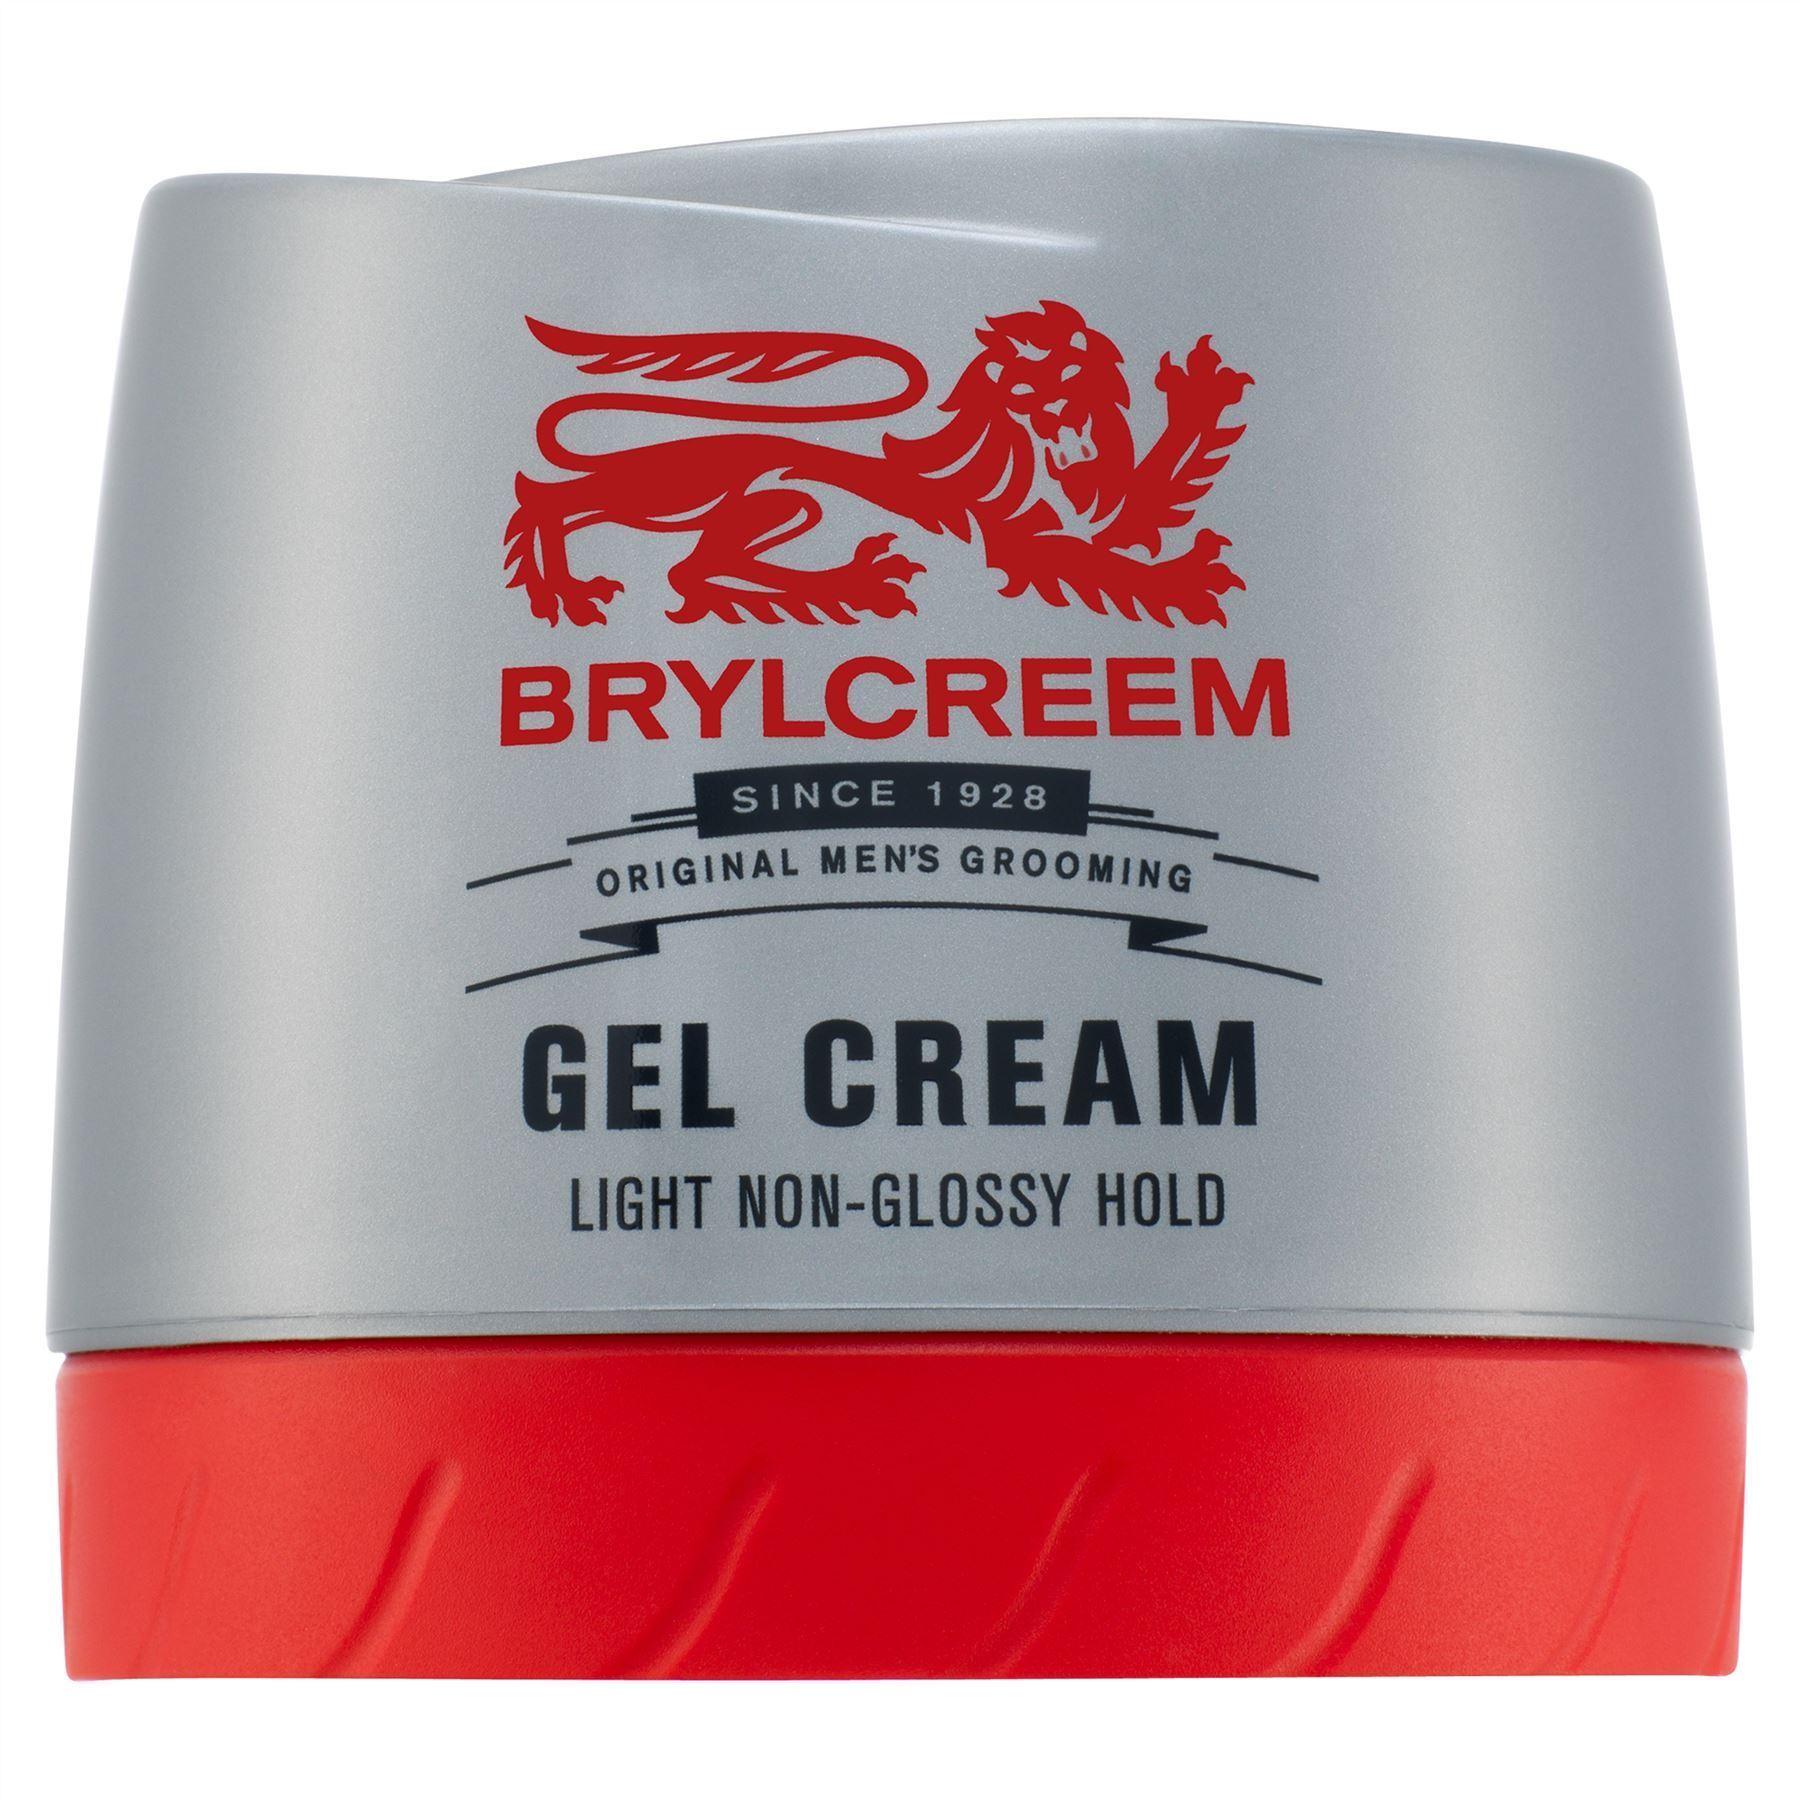 Brylcreem Light Gel Cream - 2 for £5 - Boots